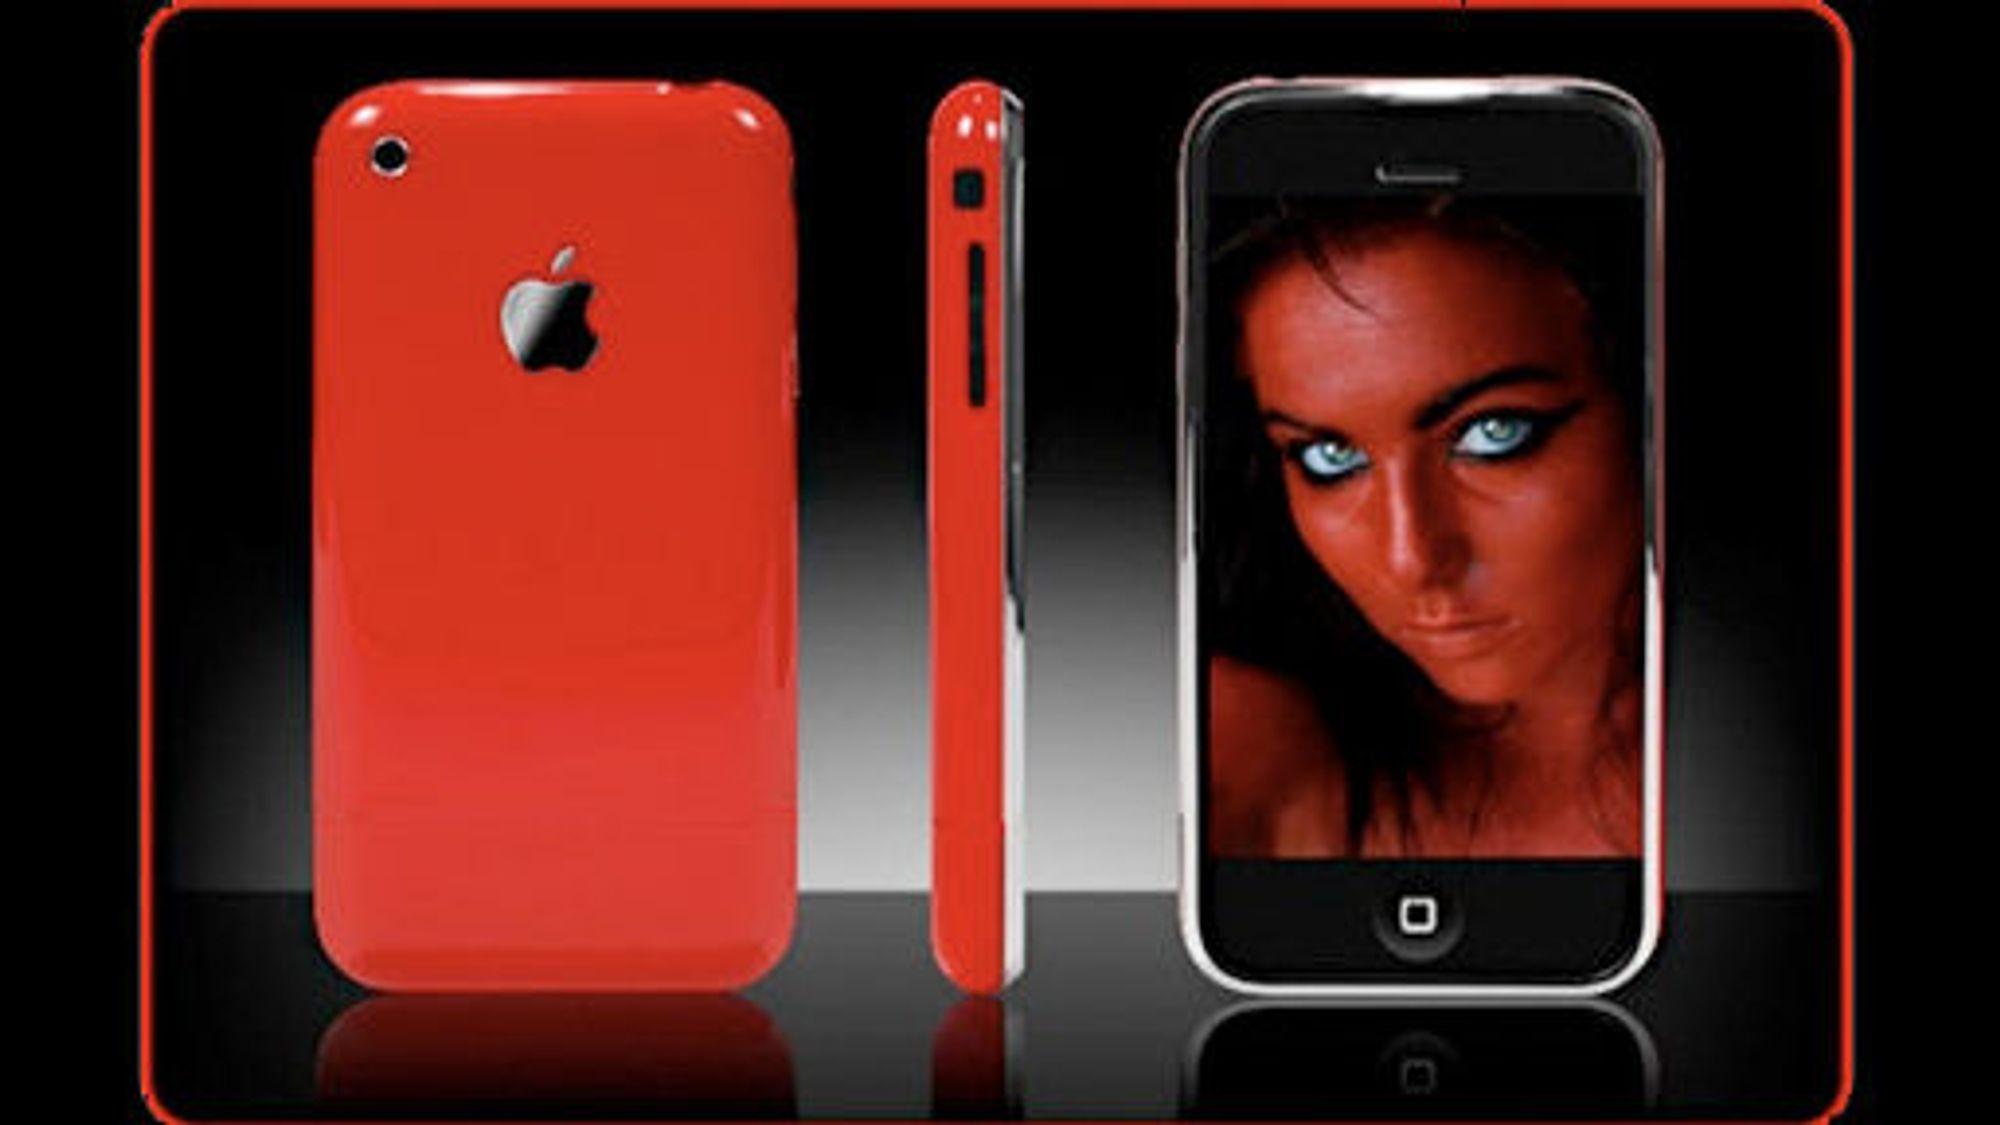 Les En rød Iphone er på vei